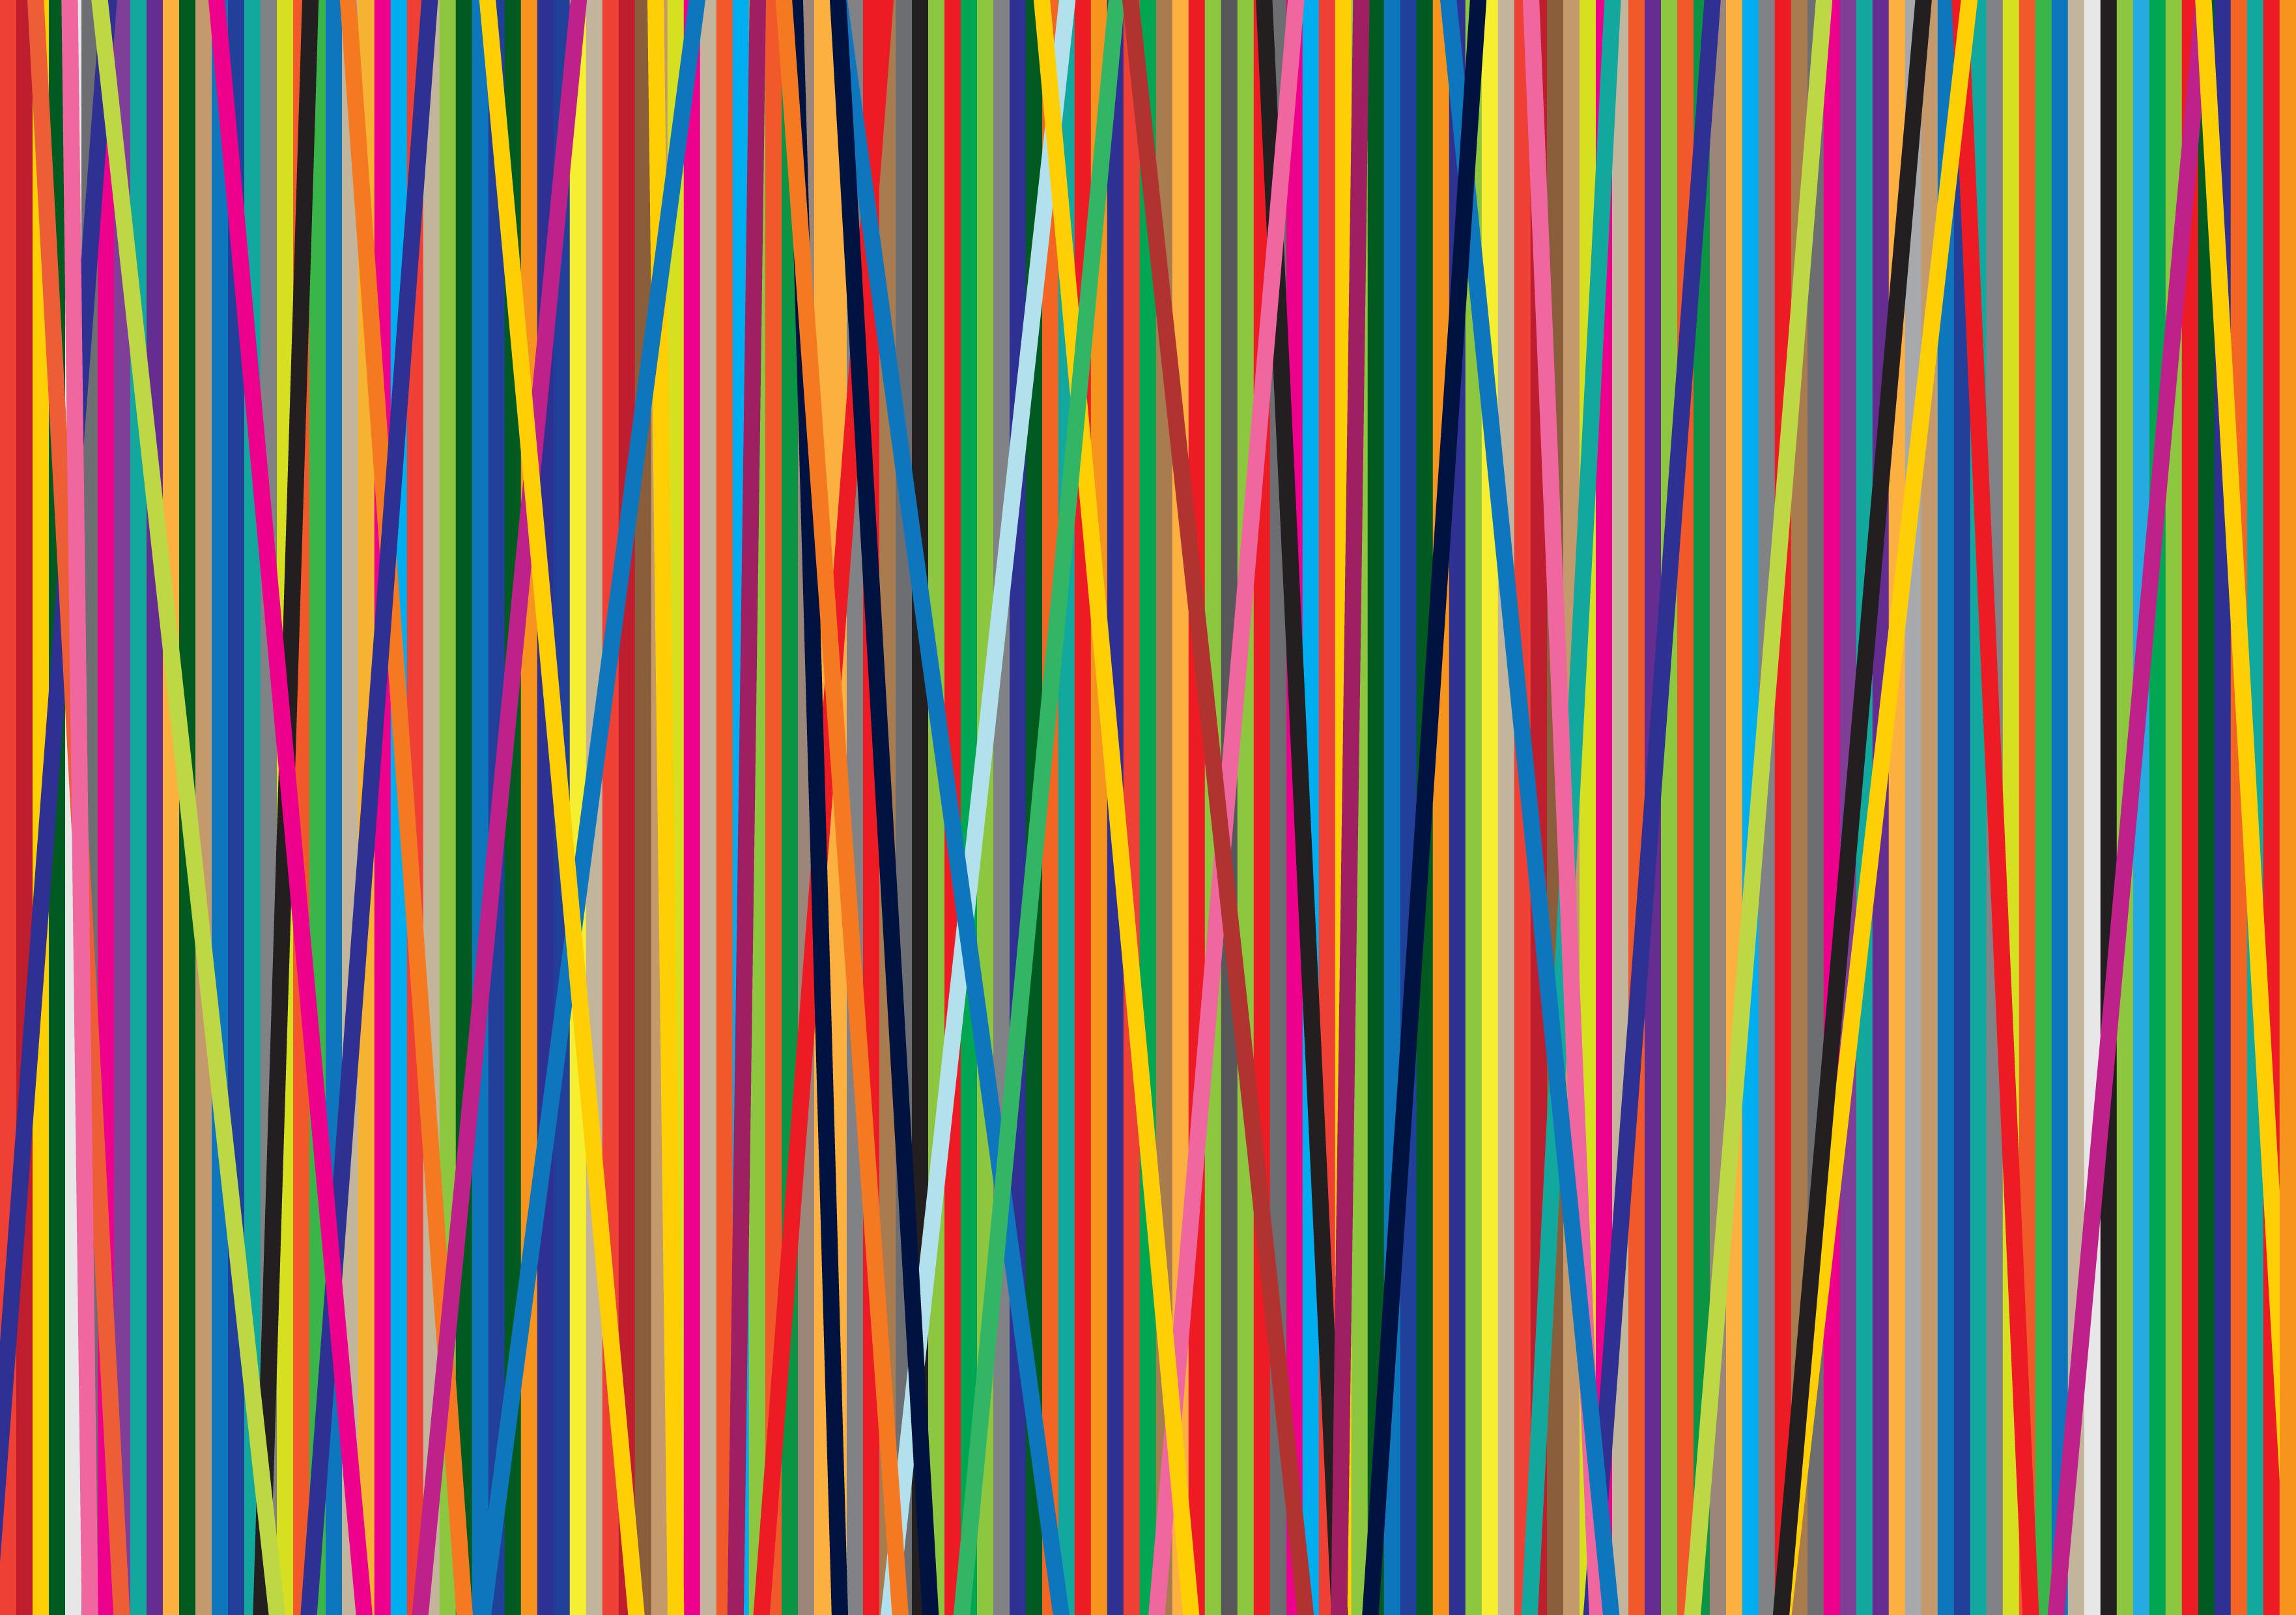 Best 57 Geometric Wallpaper on HipWallpaper Geometric Wallpaper 3525x2480